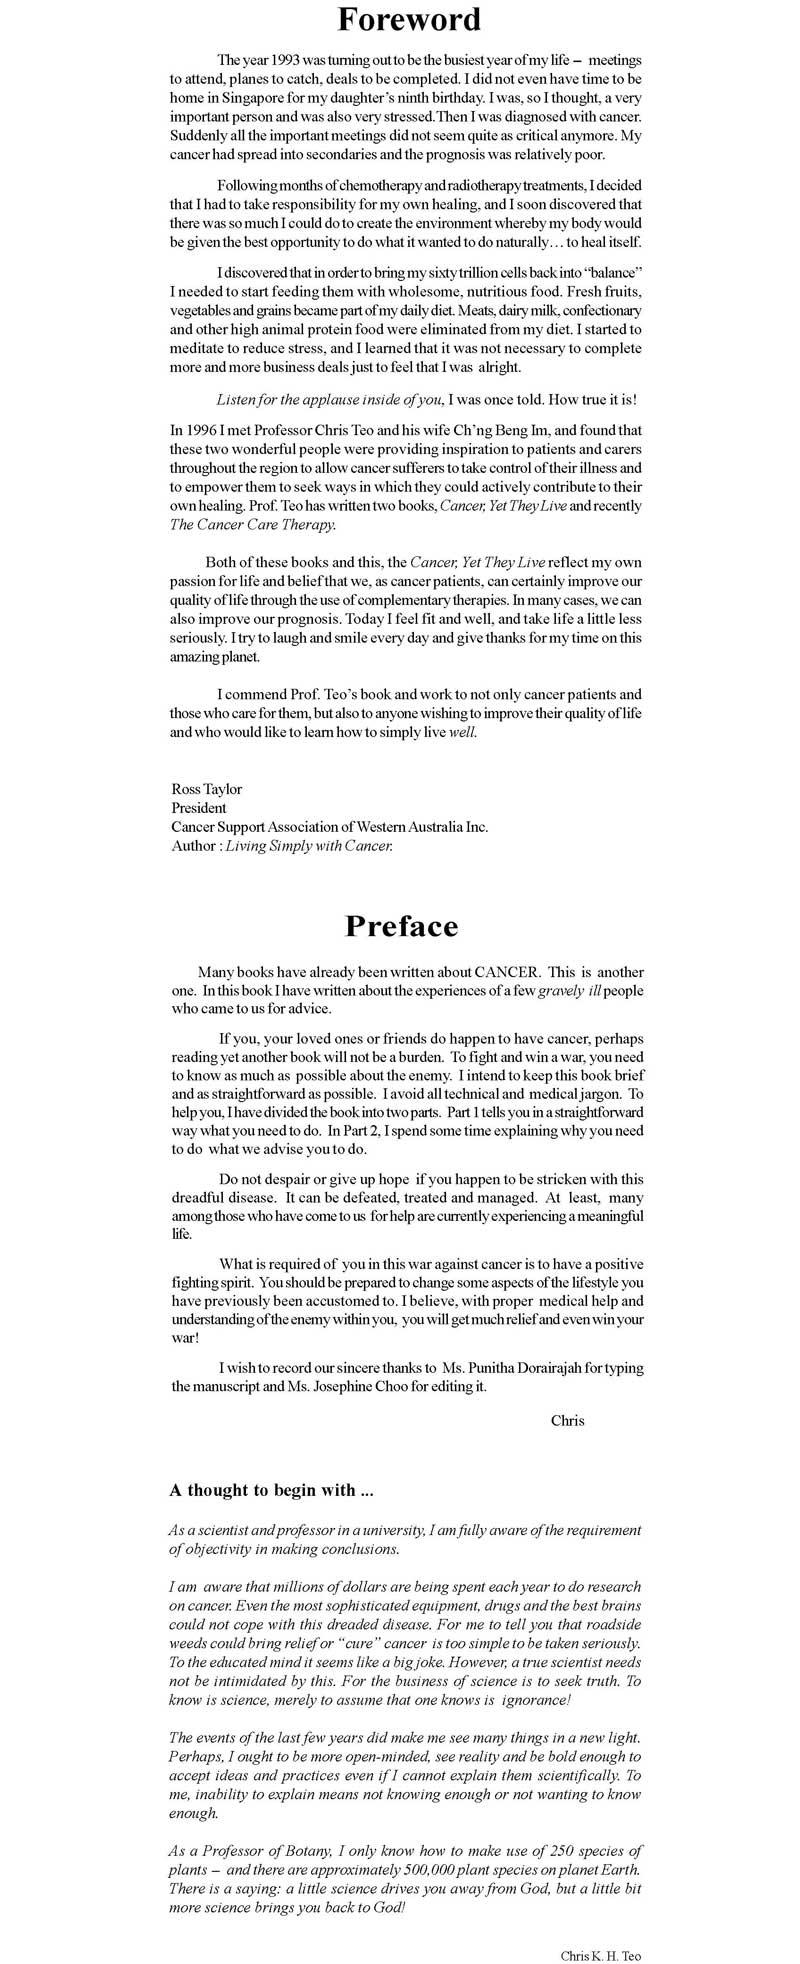 Forward-Preface-800